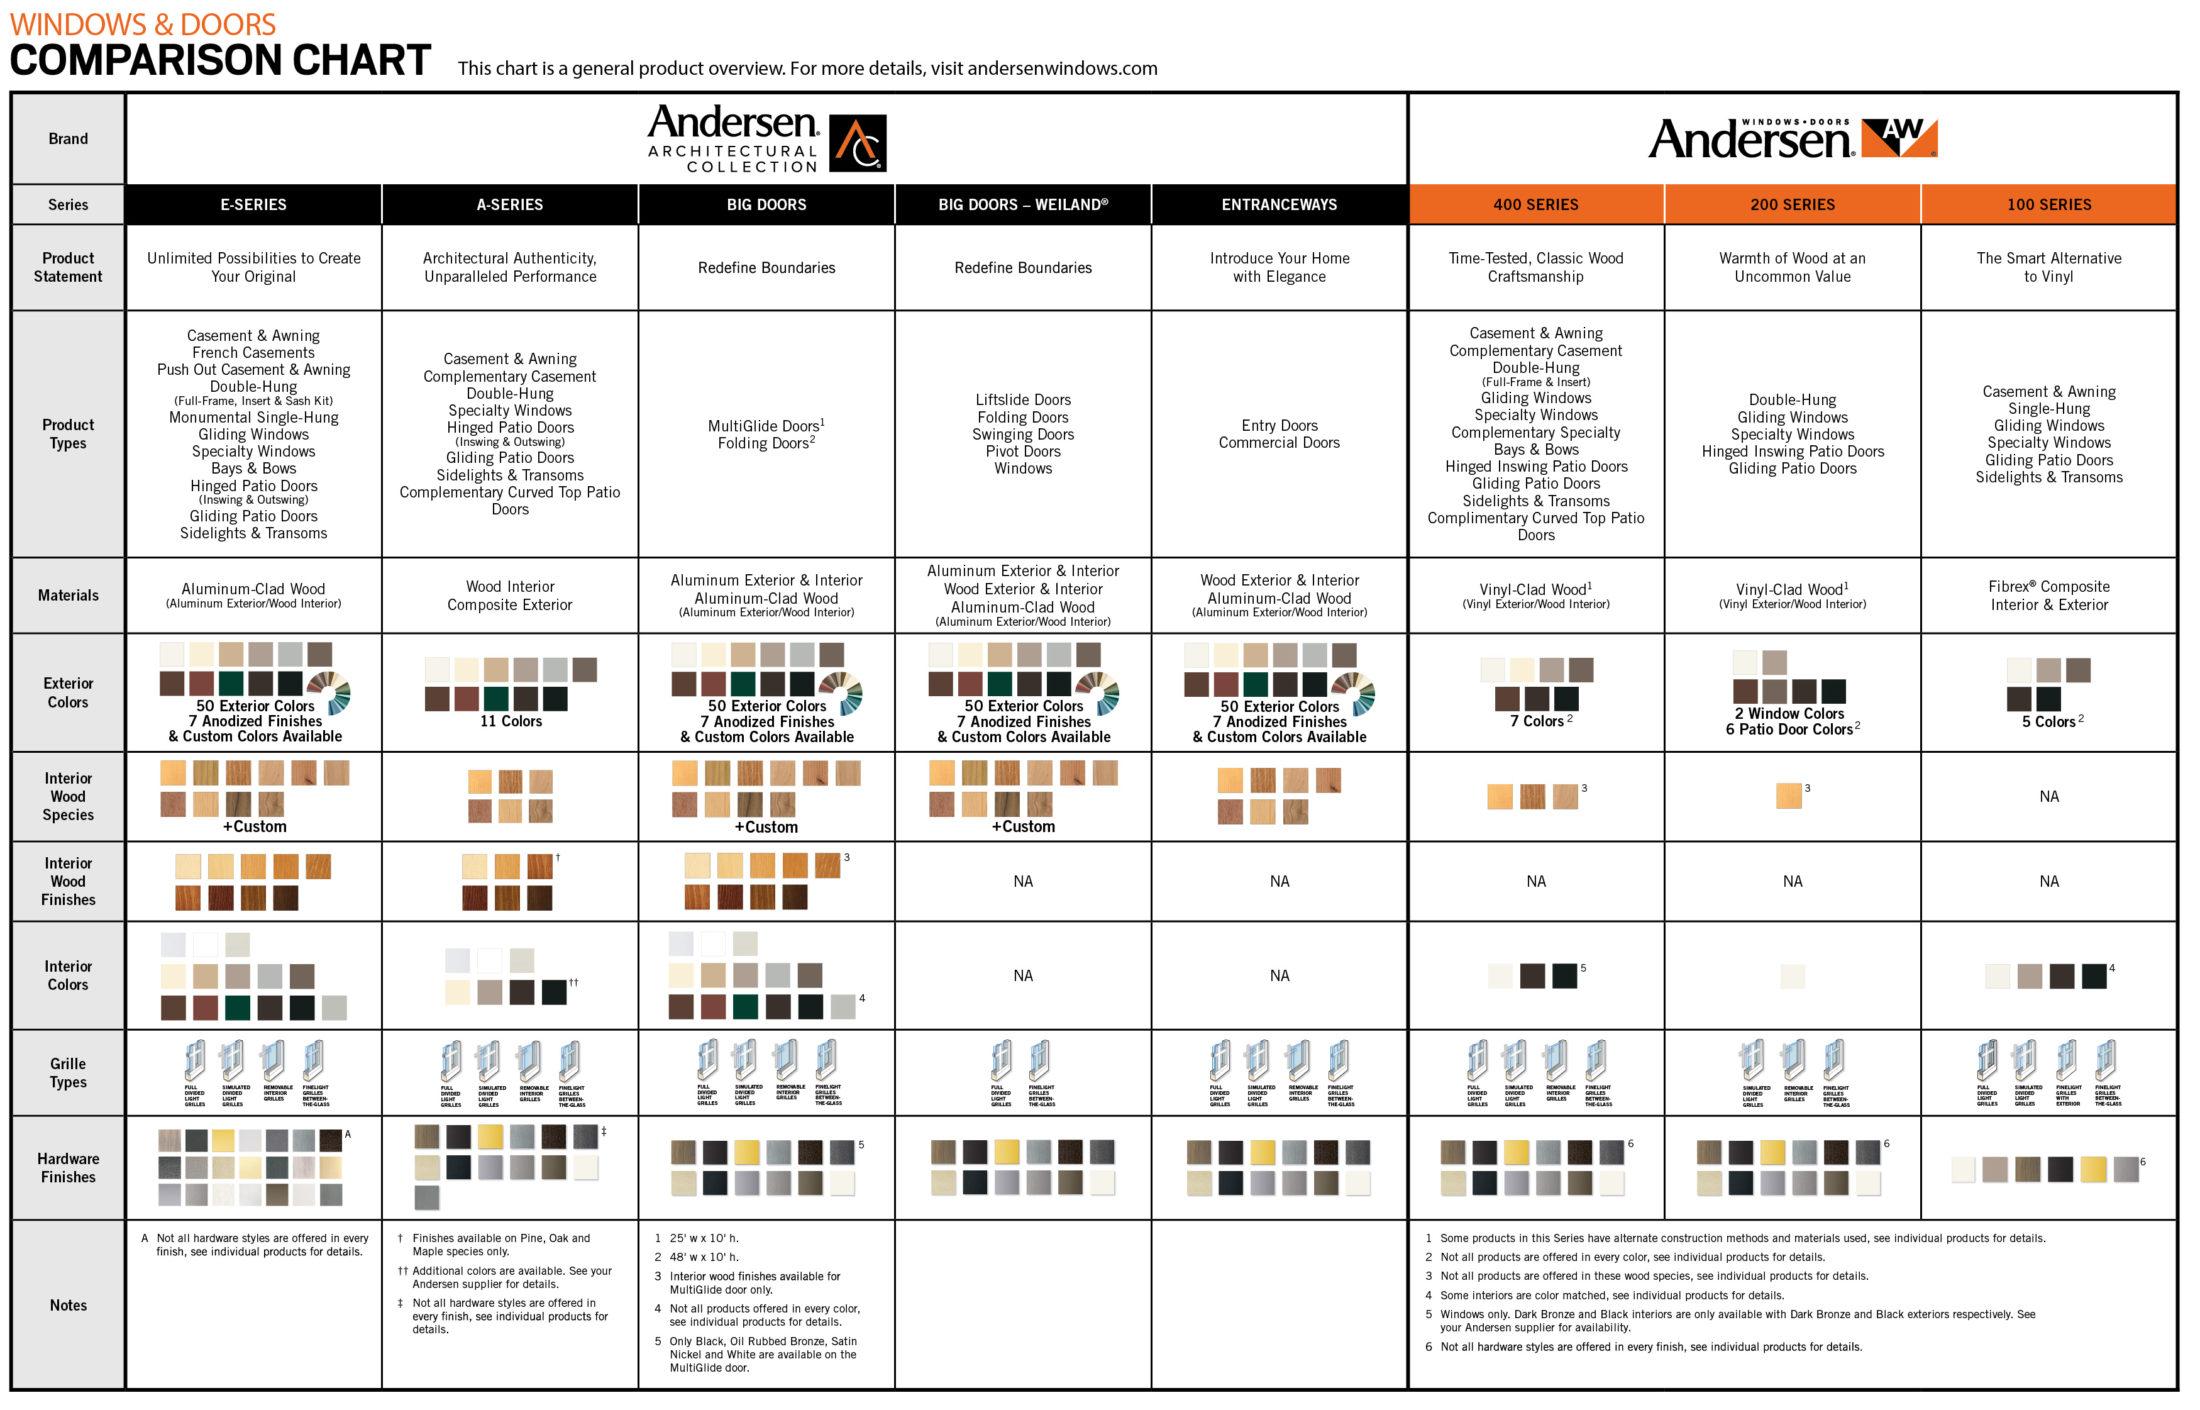 andersen-comparison-chart-02